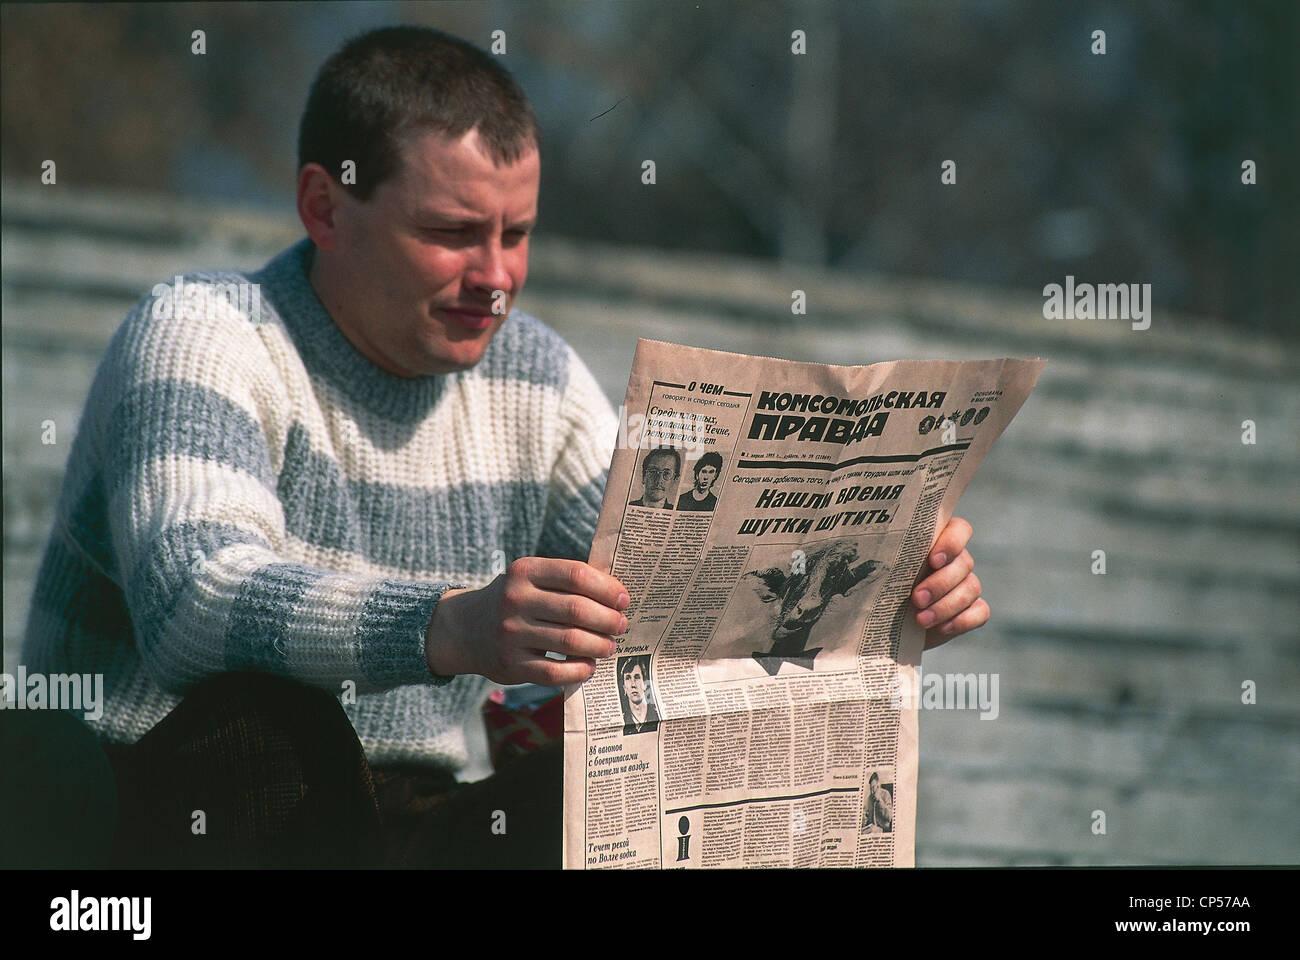 Russland-XX Jahrhundert. Neunziger Jahre - Sibirien - Irkutsk. Mann liest Zeitung Komsomolskaya Pravda Stockbild